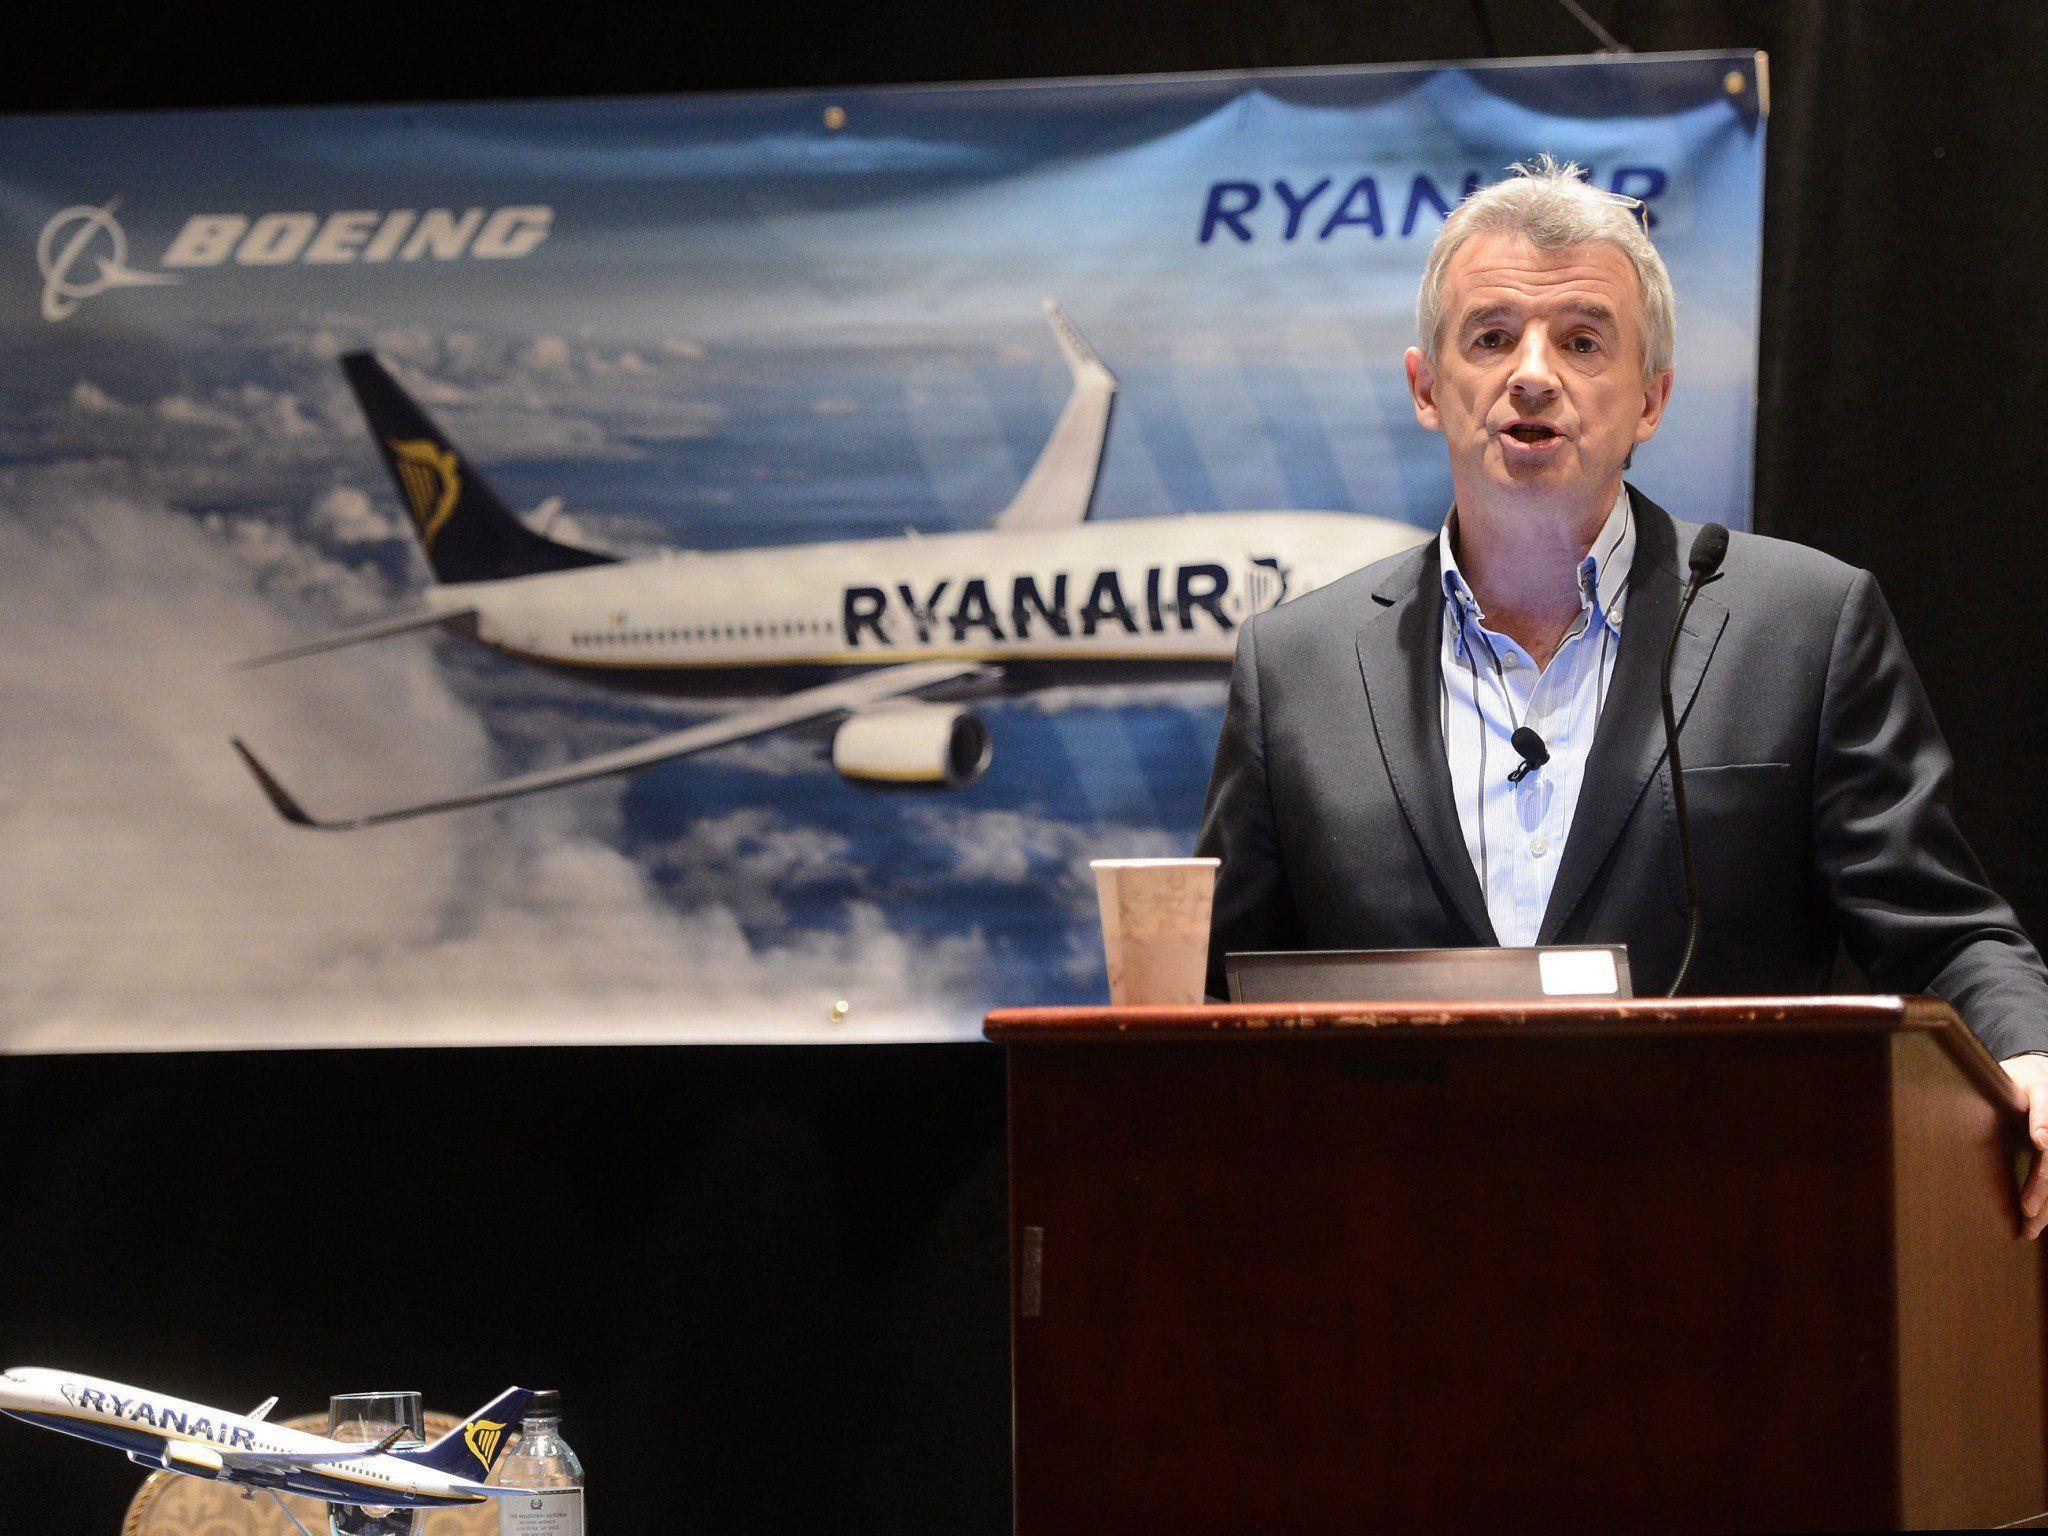 Norwegische Minister wollen Airline boykottieren.